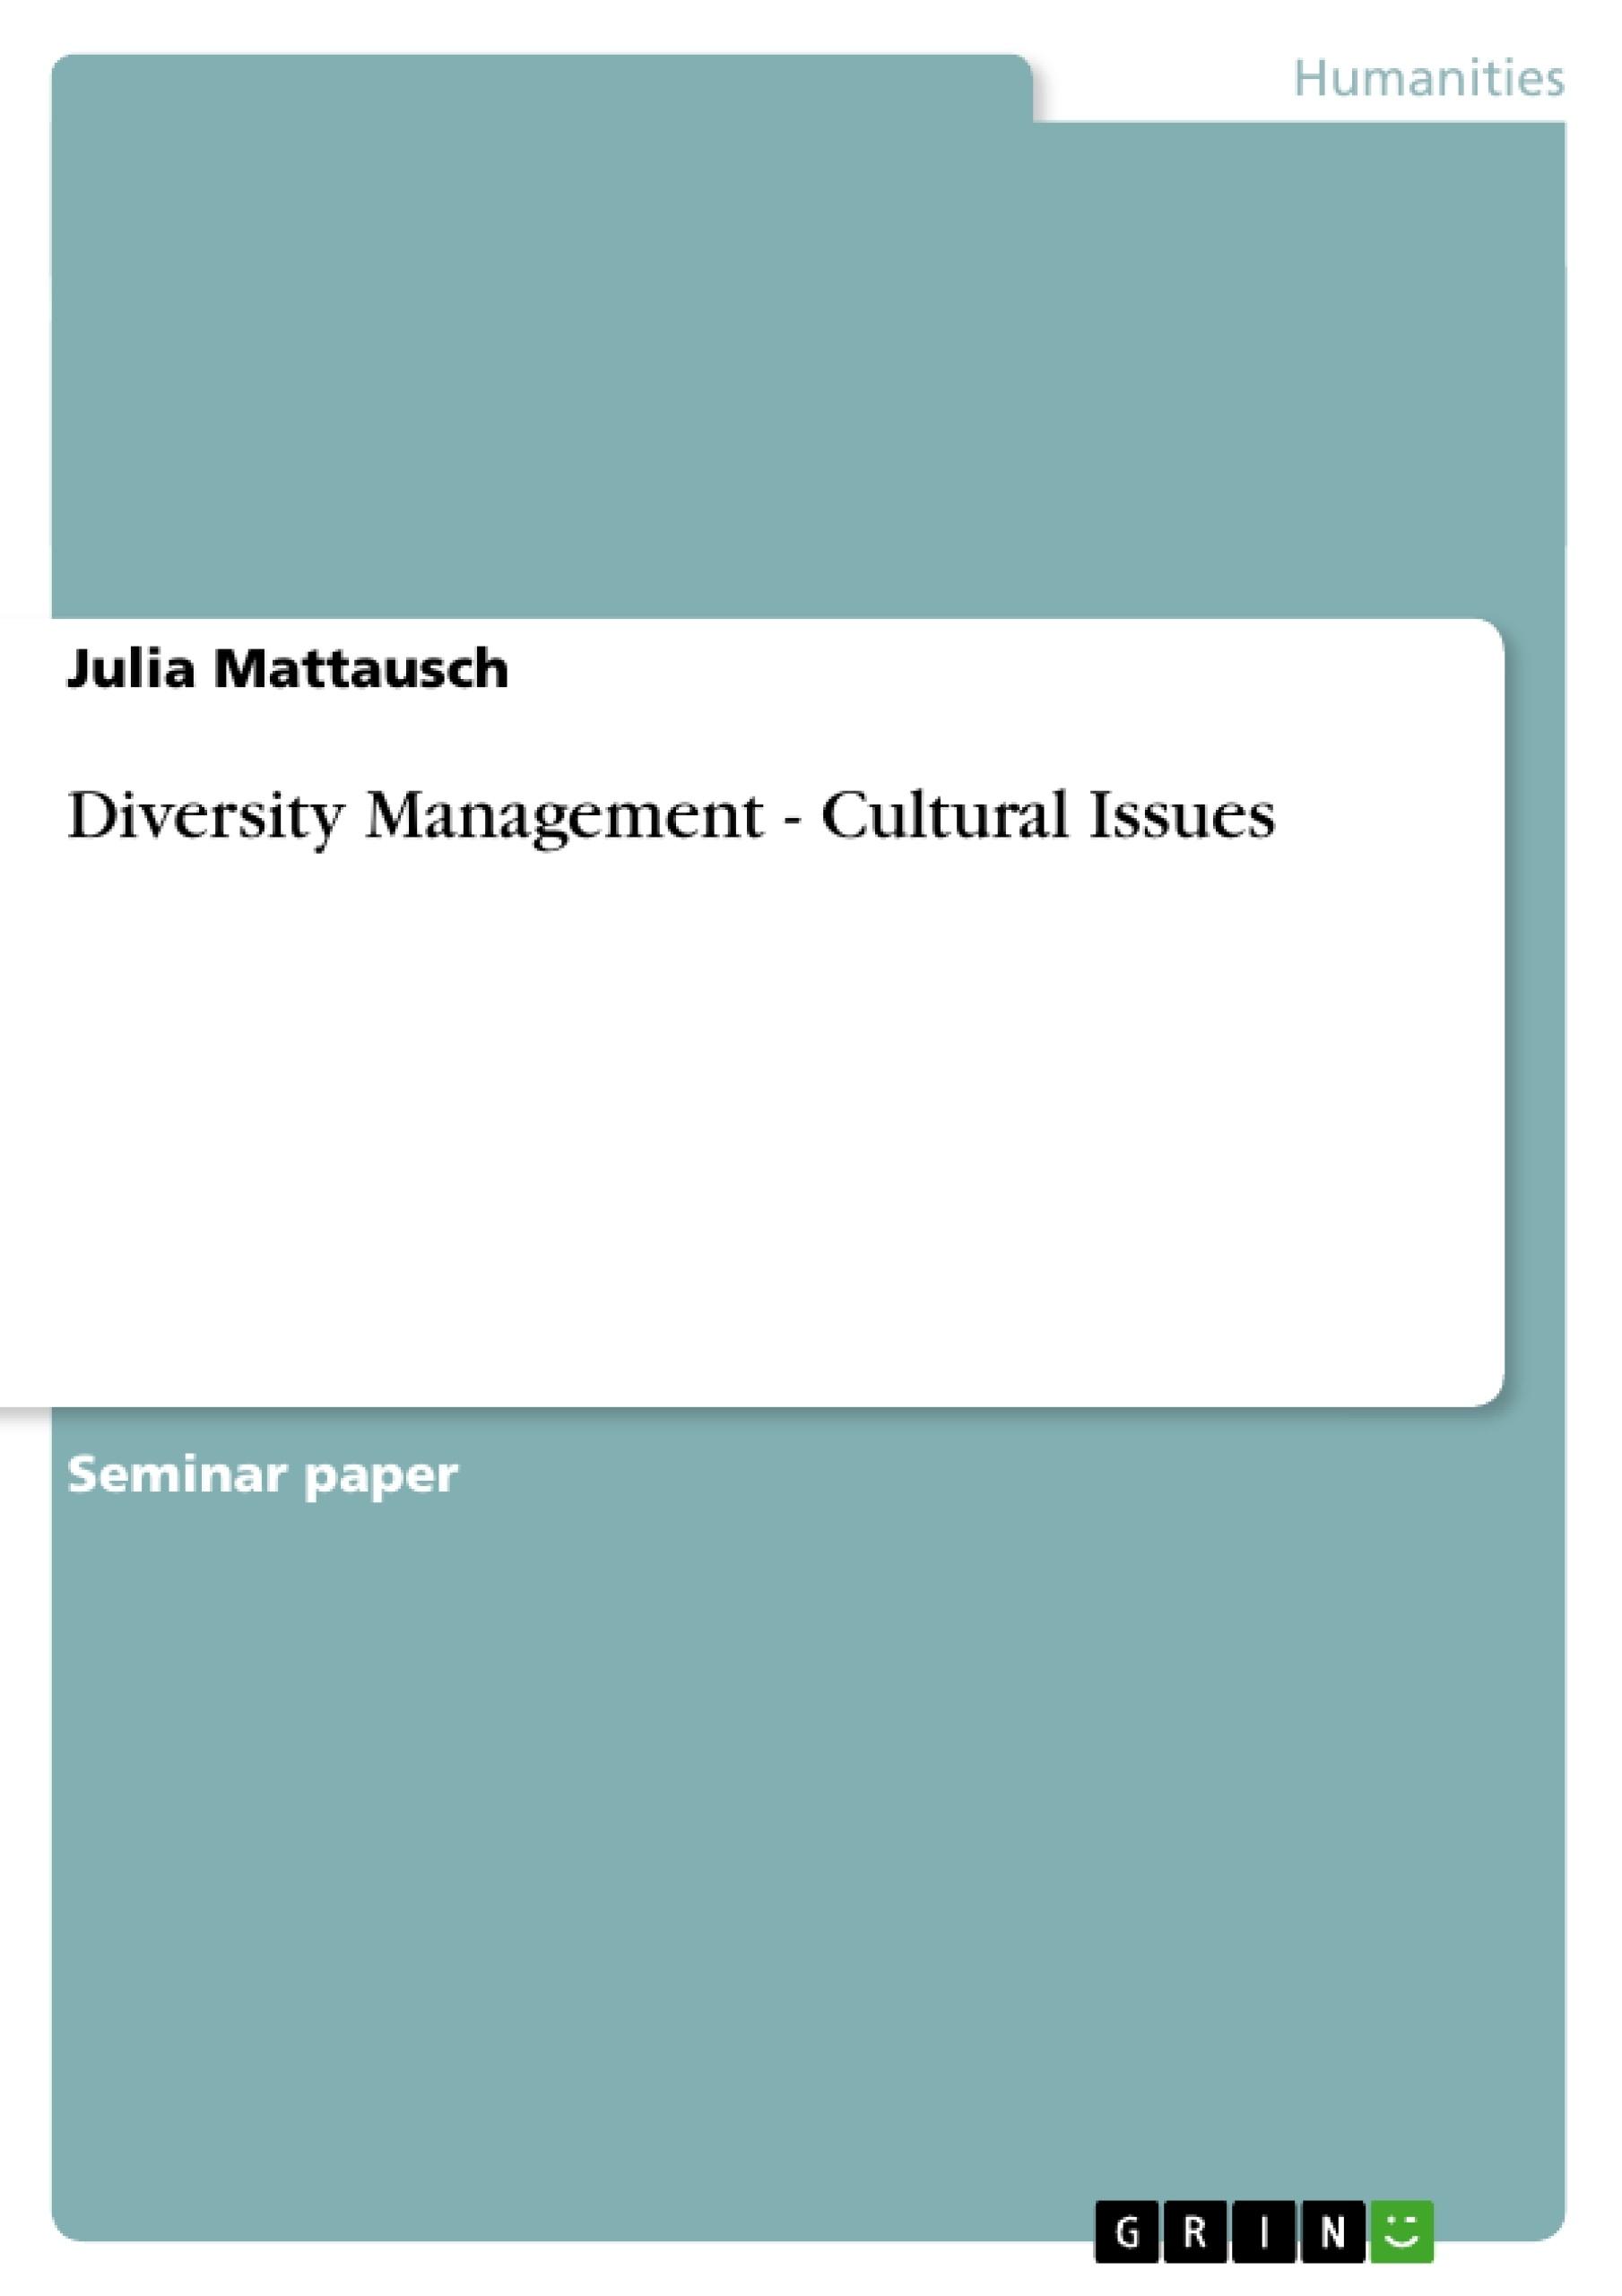 Title: Diversity Management - Cultural Issues